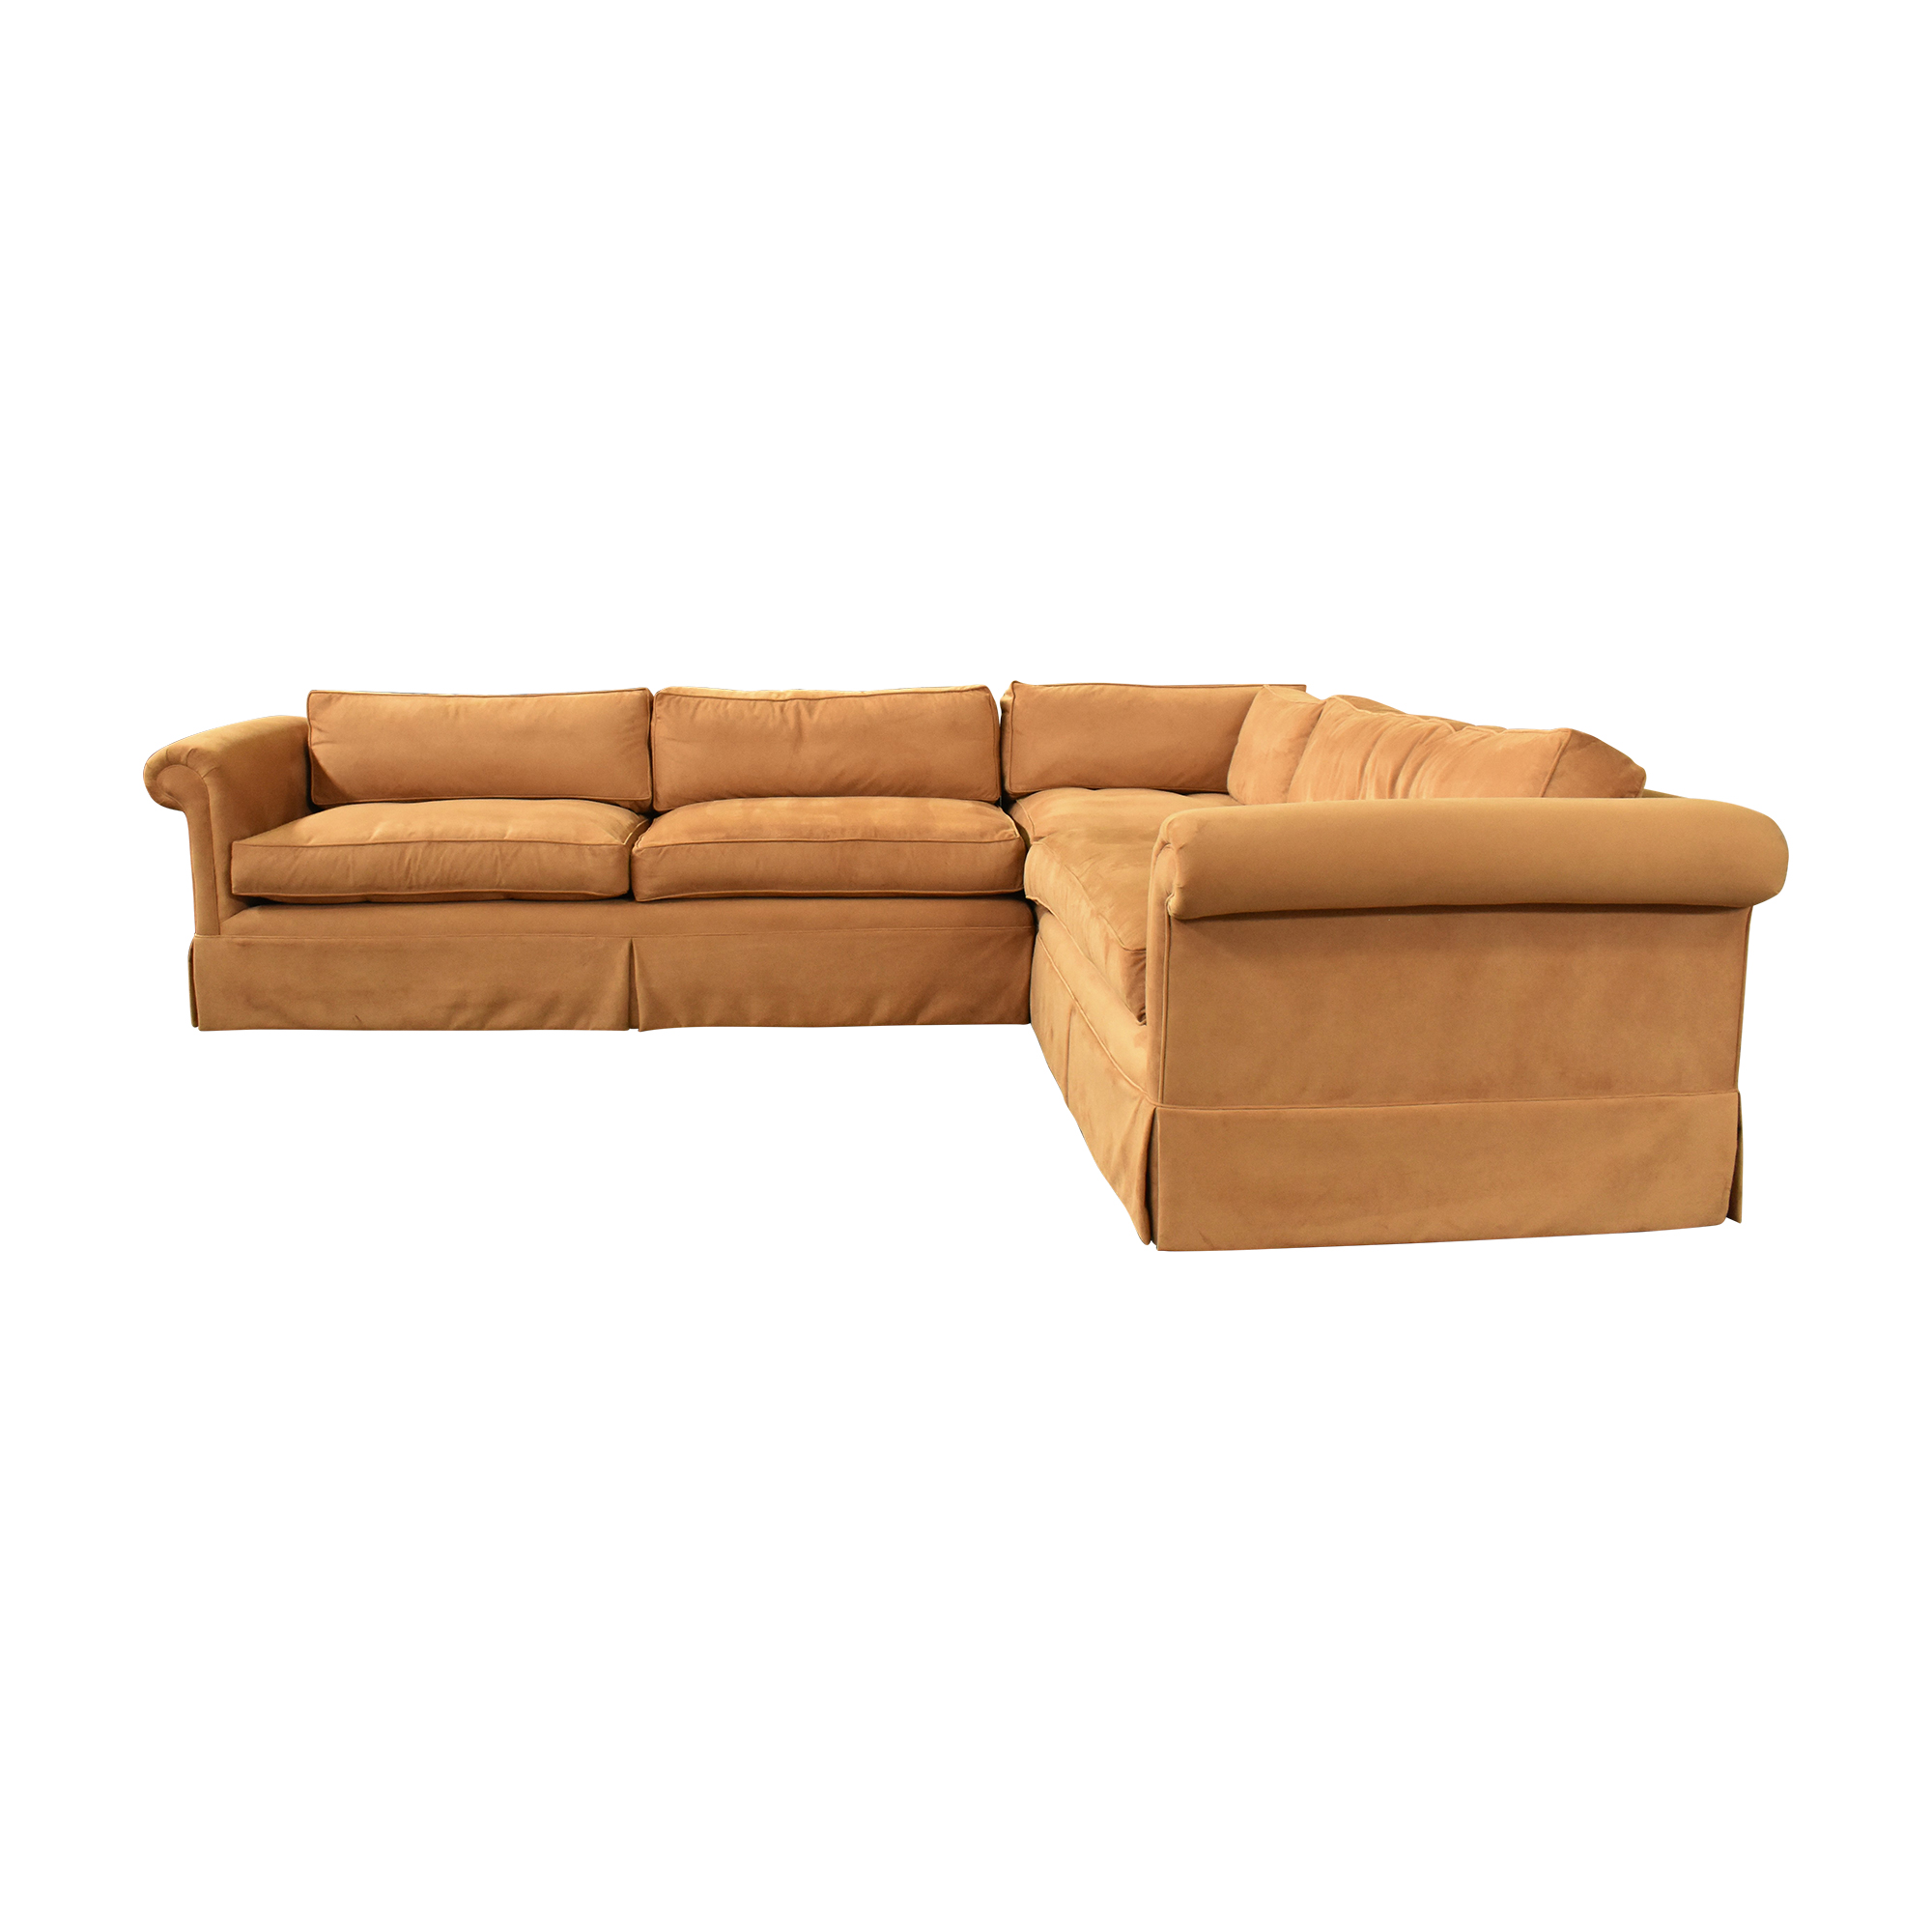 Custom Corner Sectional Sofa second hand